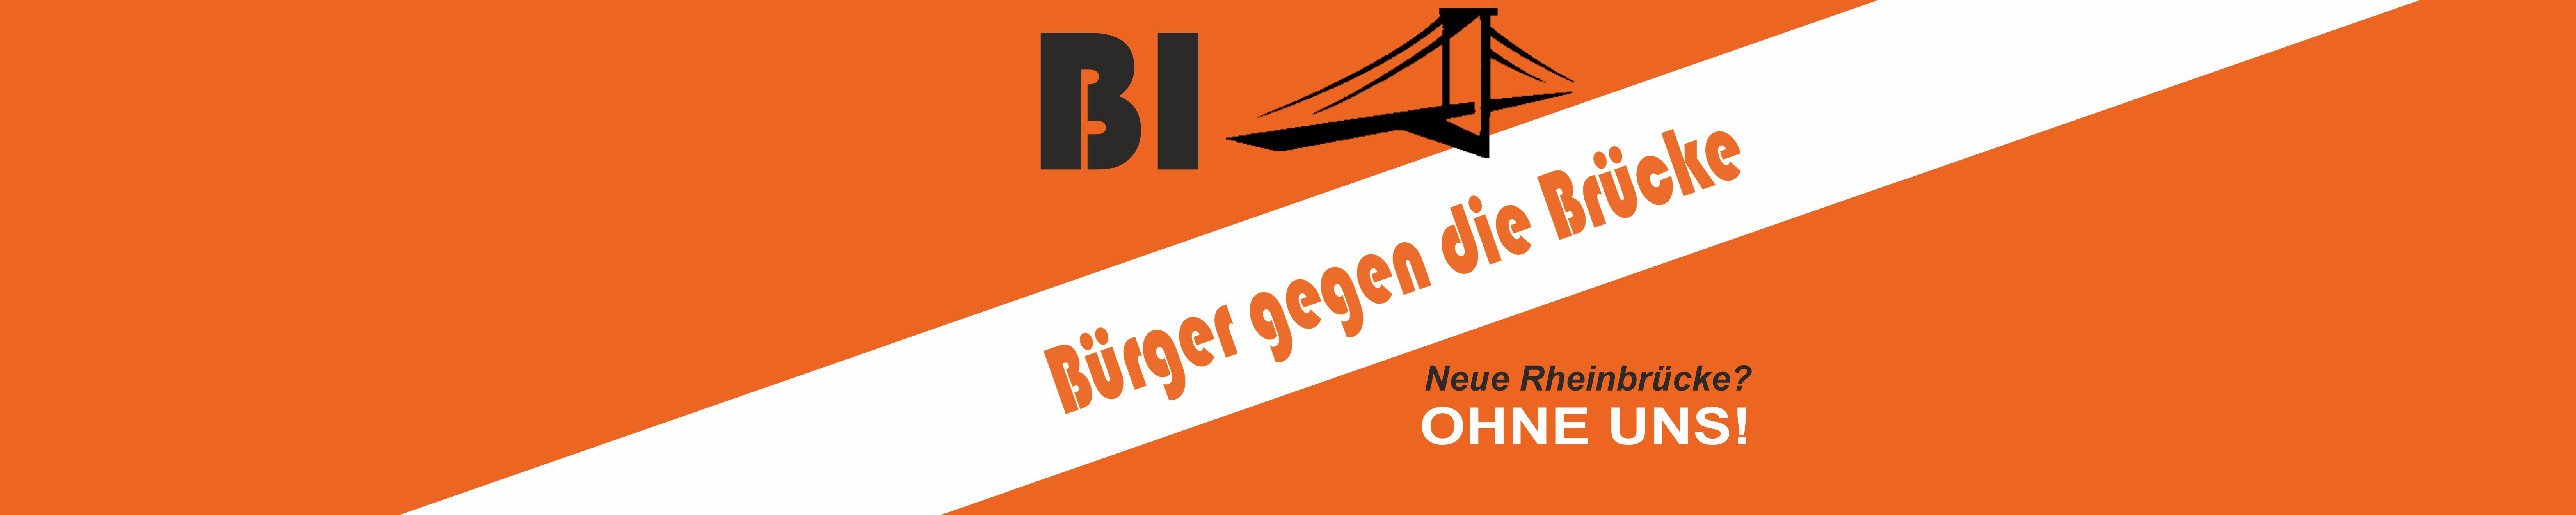 Bürgerinitiative gegen die Brücke